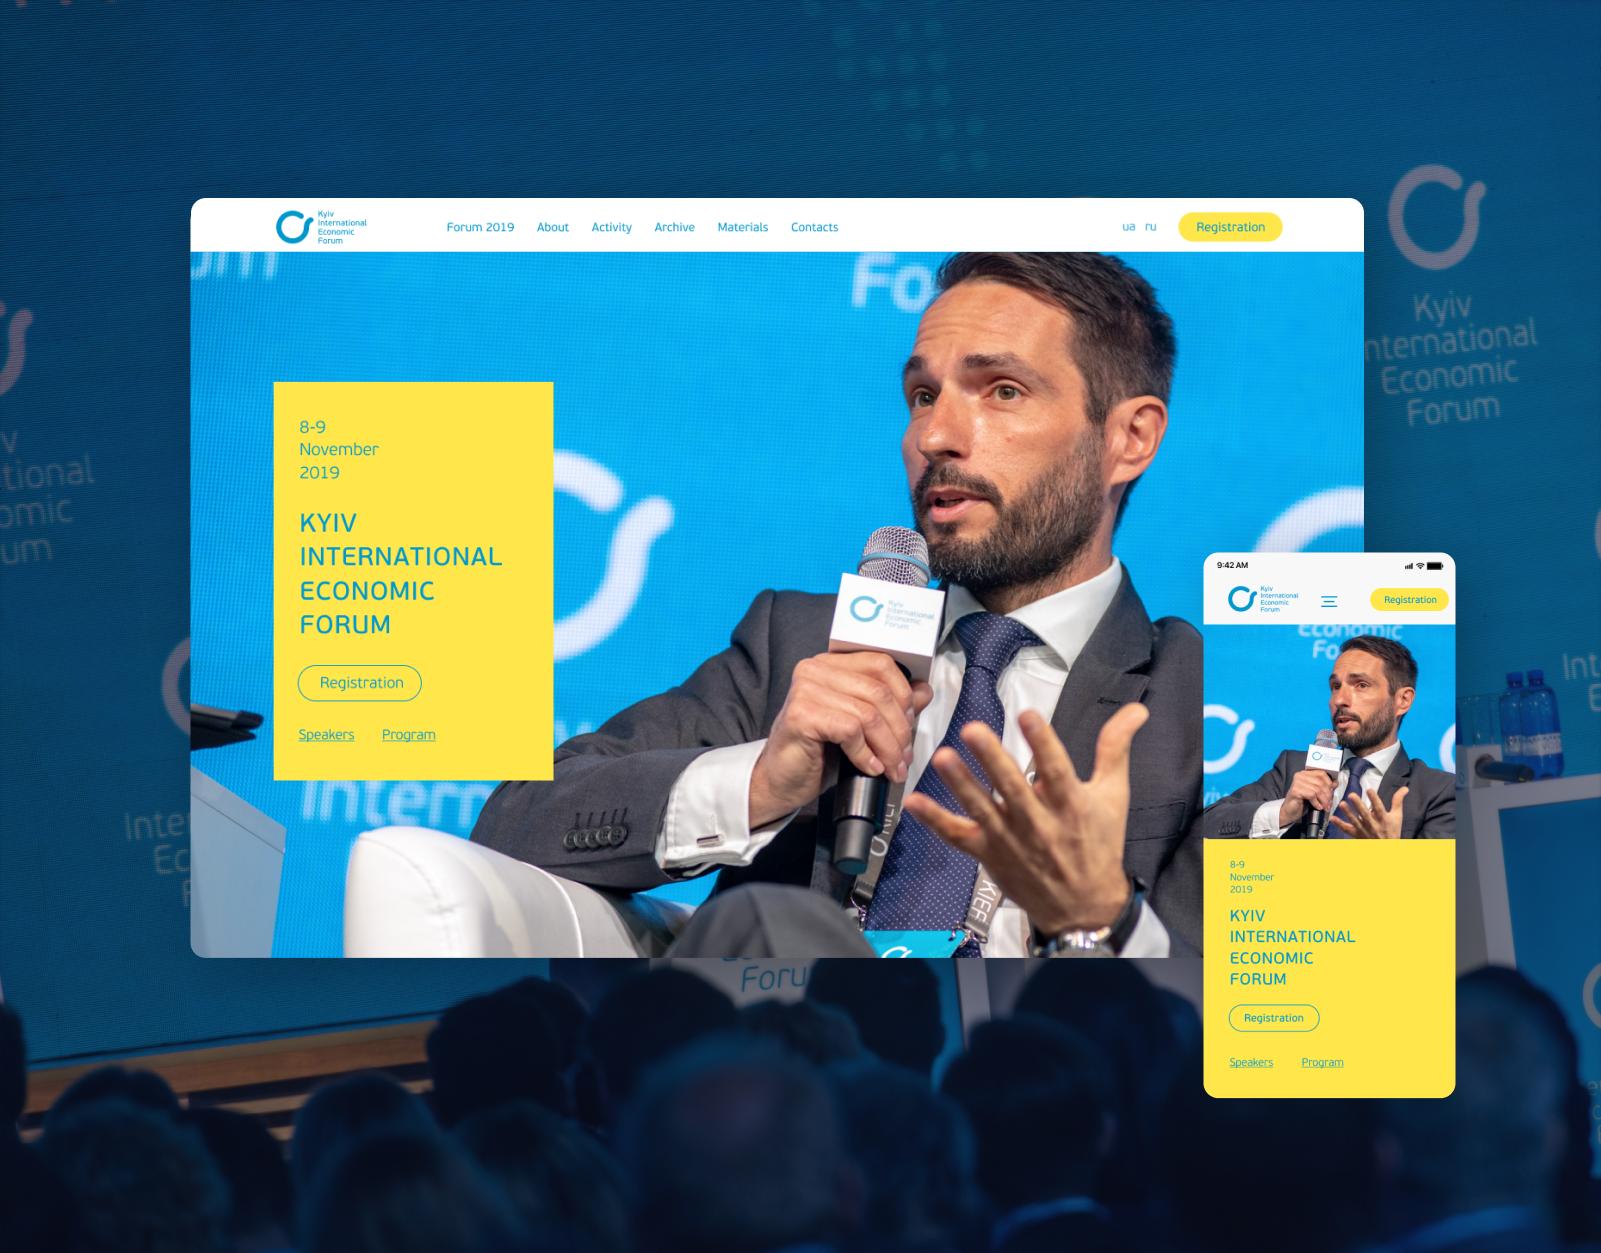 Kiev International Economic Forum